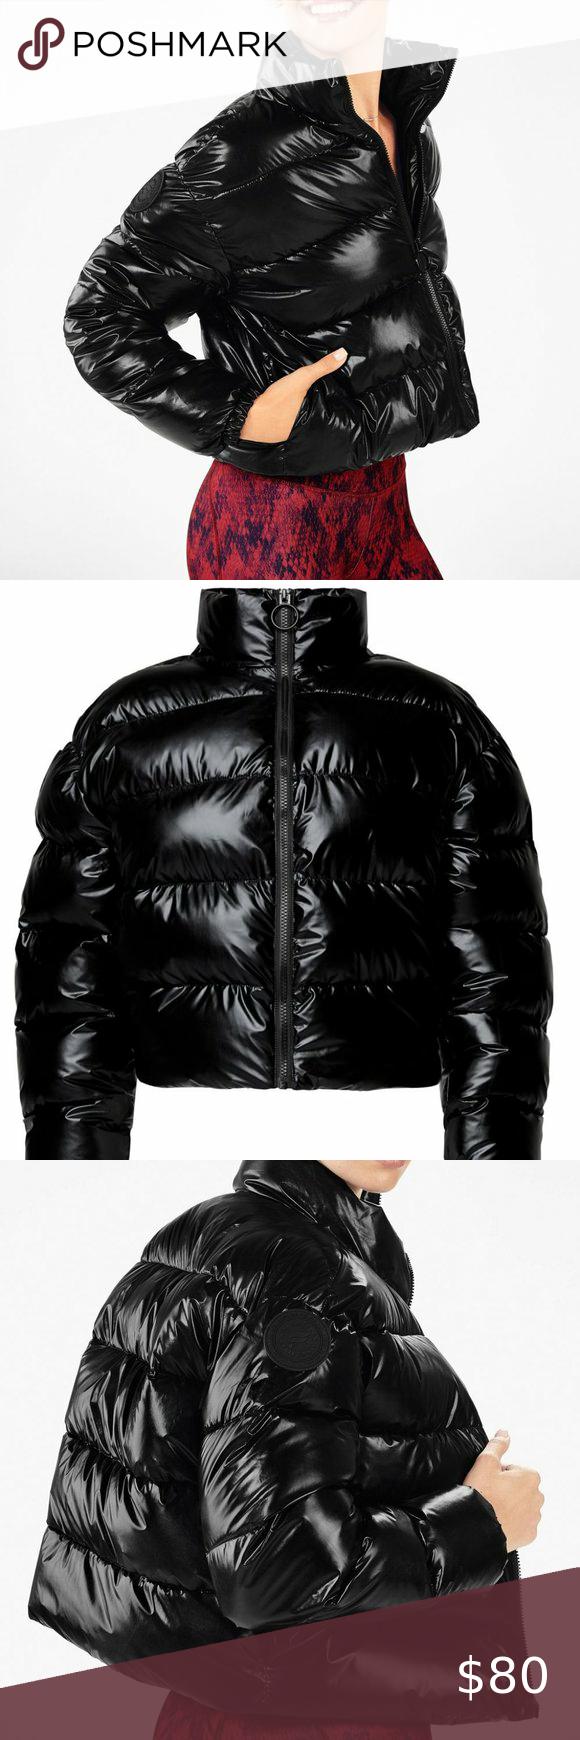 Fabletics Wander Puffer Jacket Fashion Fashion Design Clothes Design [ 1740 x 580 Pixel ]